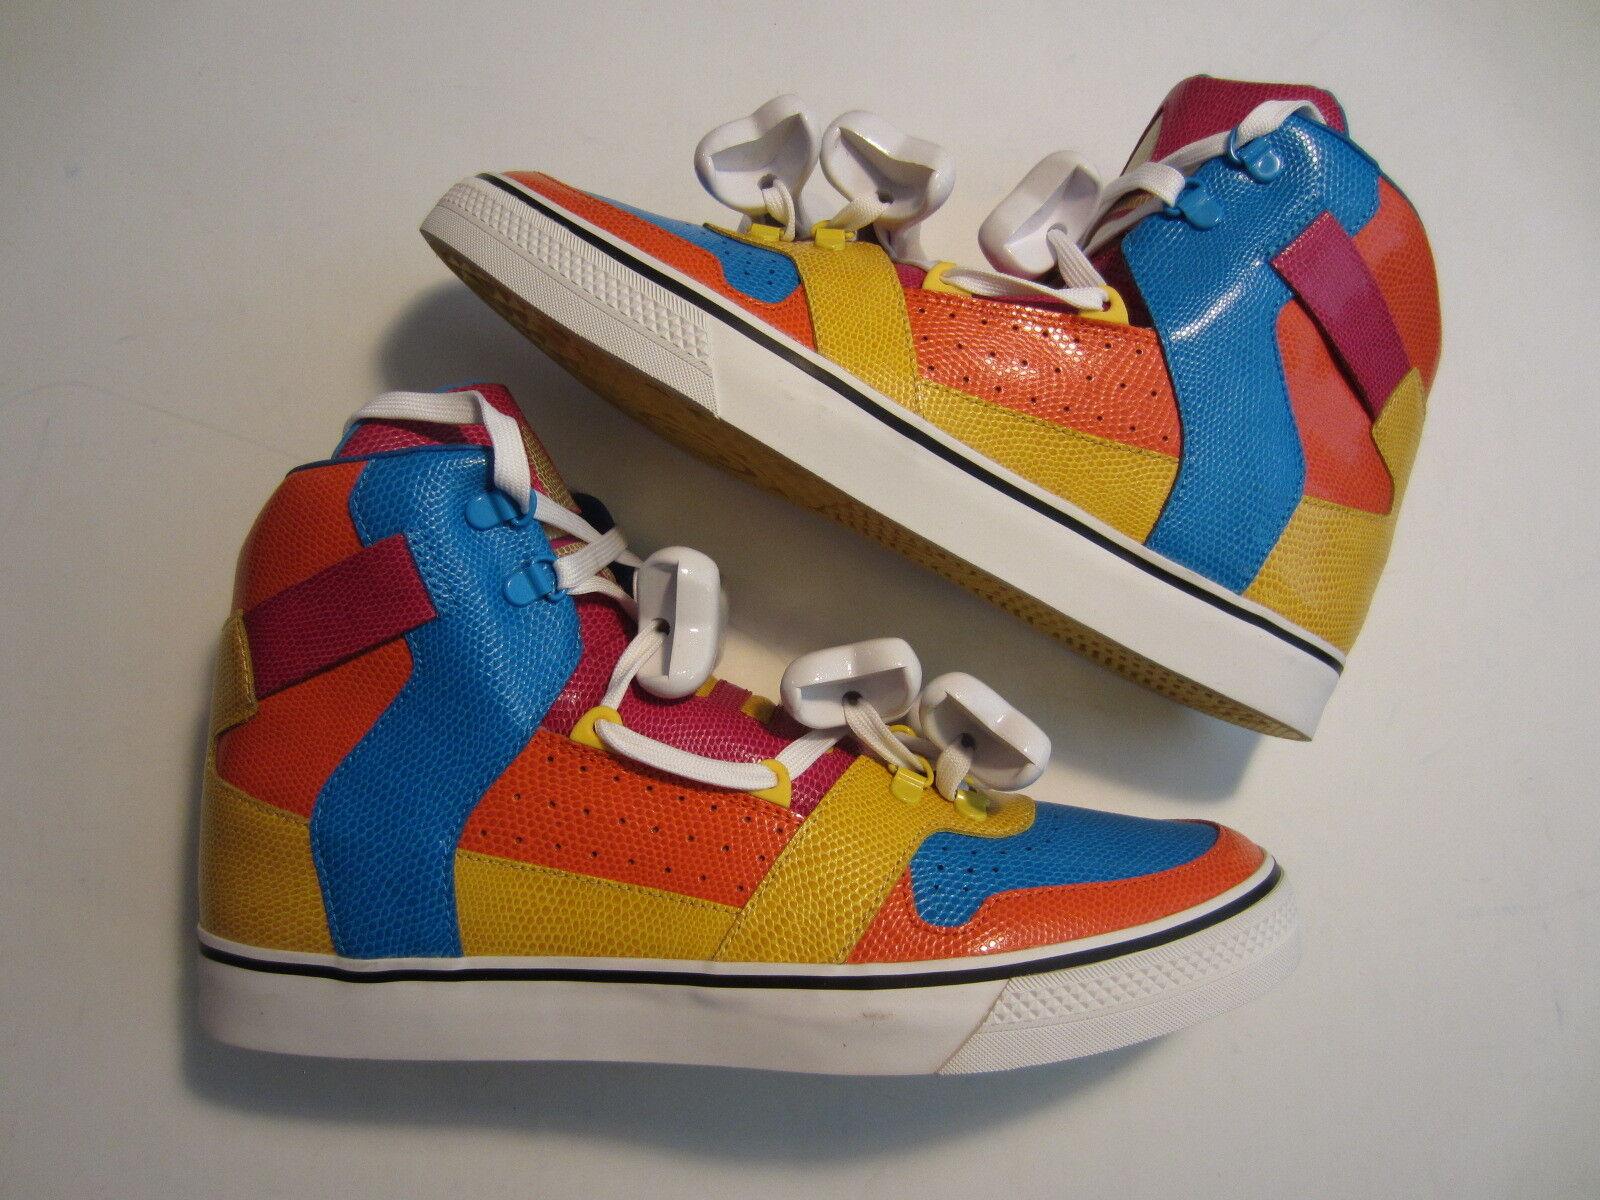 NEW Adidas Jeremy Scott Bones Multicolore men scarpe D65207 tiger tiger tiger wings poodle 11.5 8629a9